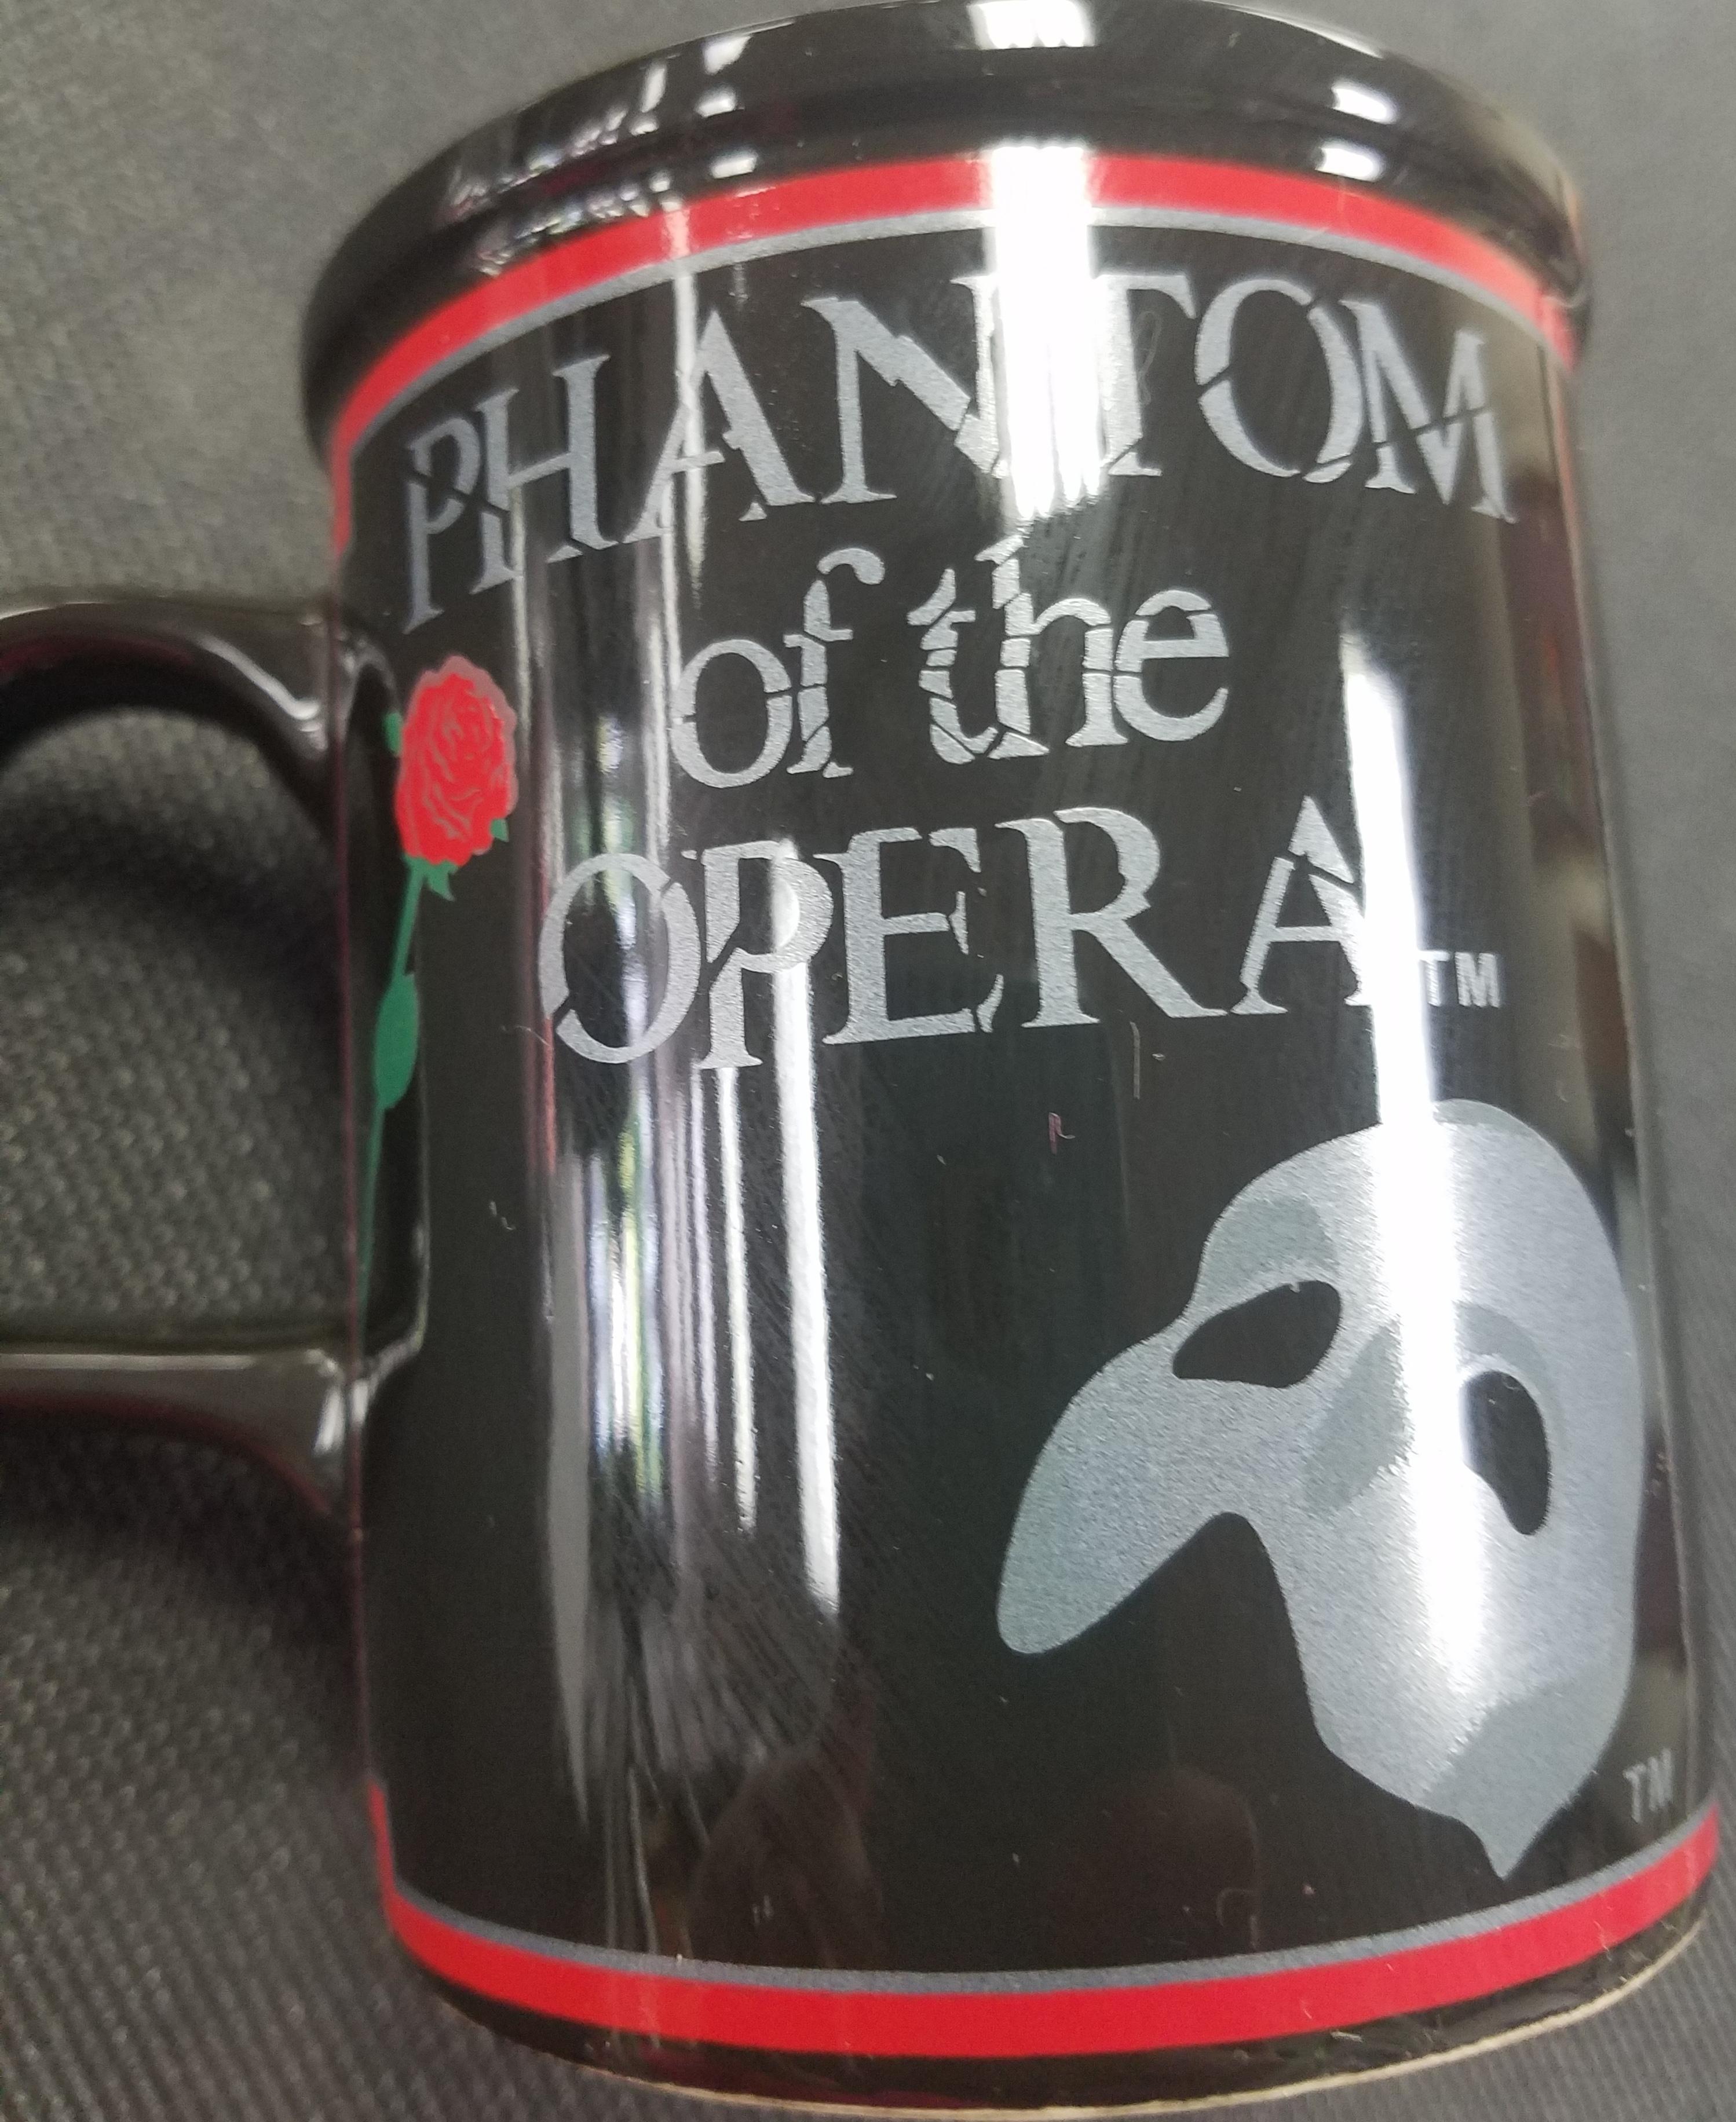 1988 PHANTOM OF THE OPERA COFFEE CUP